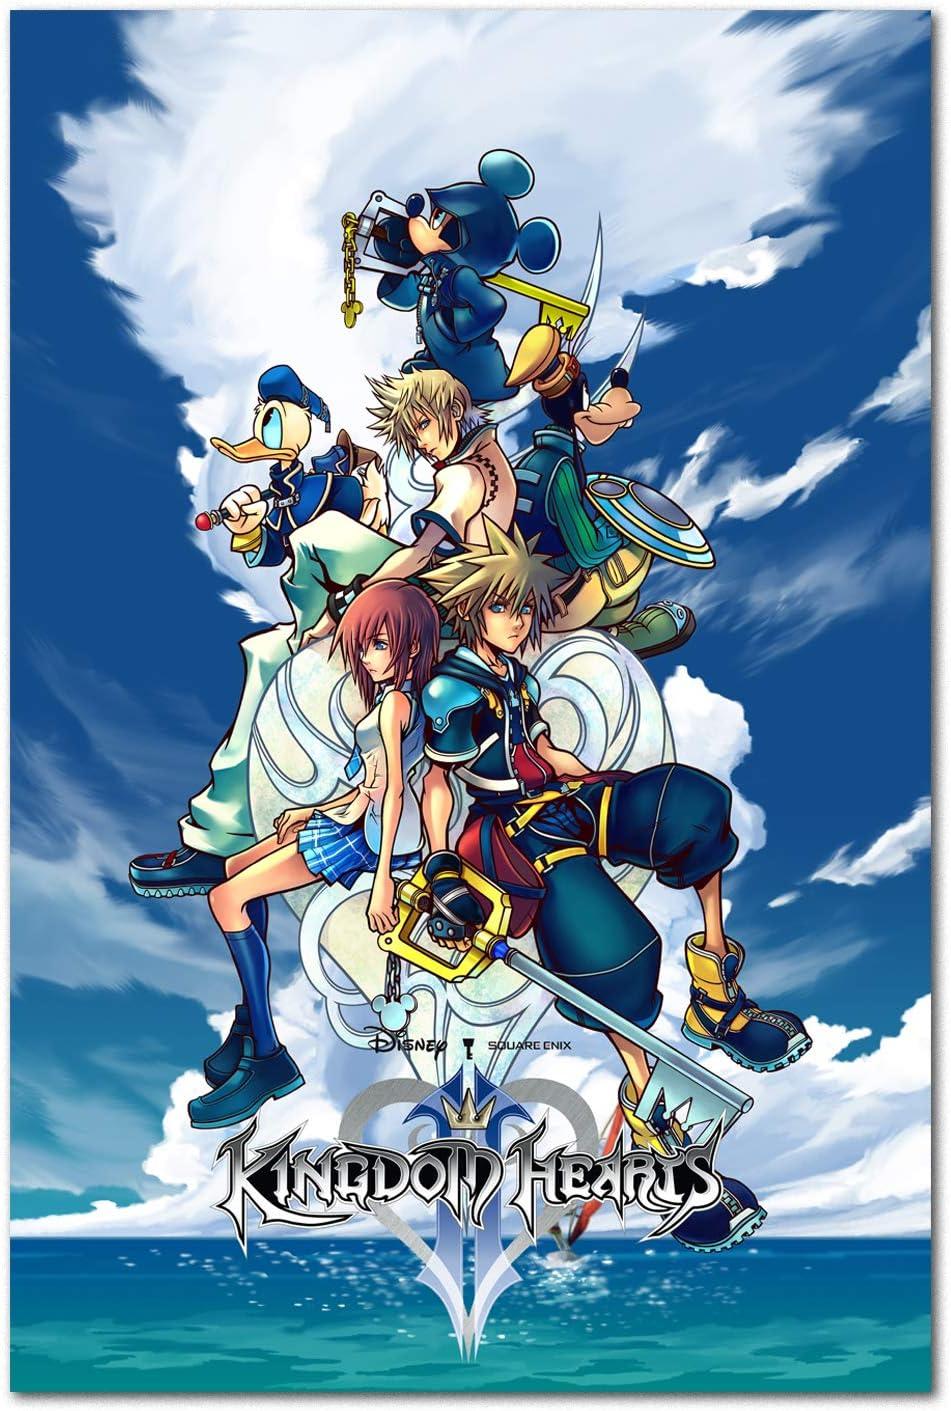 Amazon.com: Printing Pira Kingdom Hearts II Poster - PS2 Exclusive - Box Art  (11x17): Posters & Prints